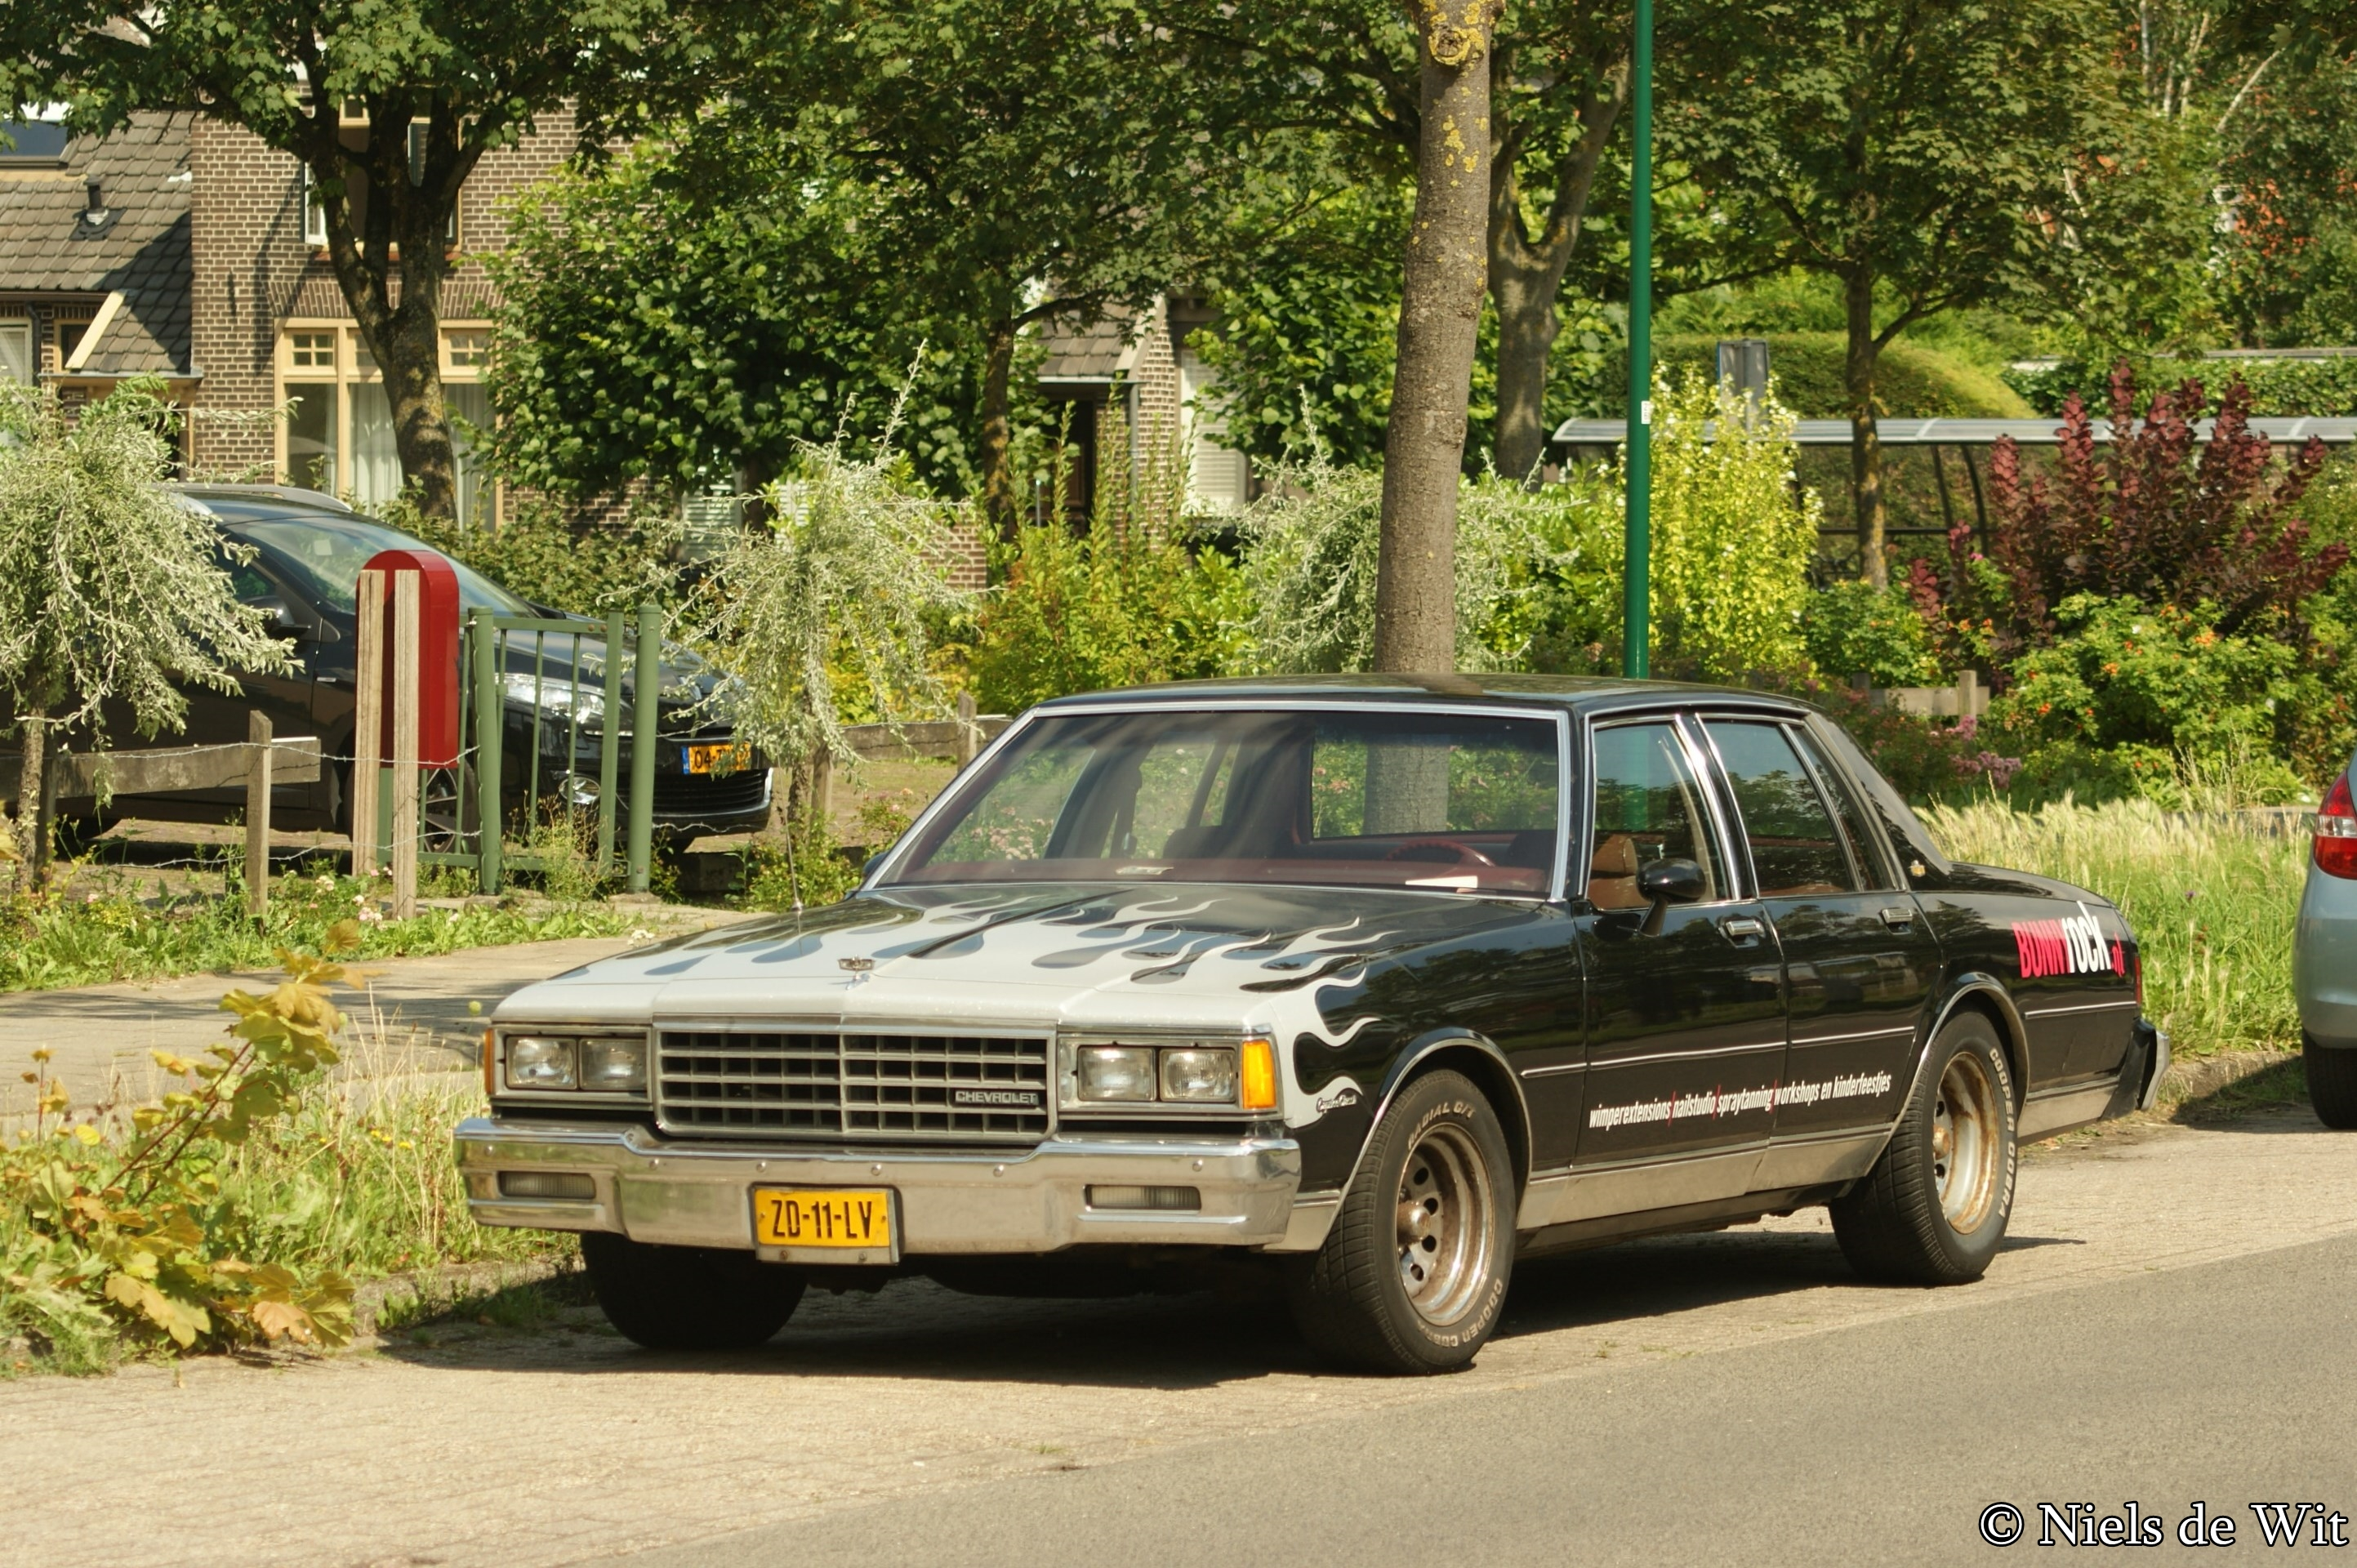 File:1983 Chevrolet Caprice Classic (9525853860) jpg - Wikimedia Commons